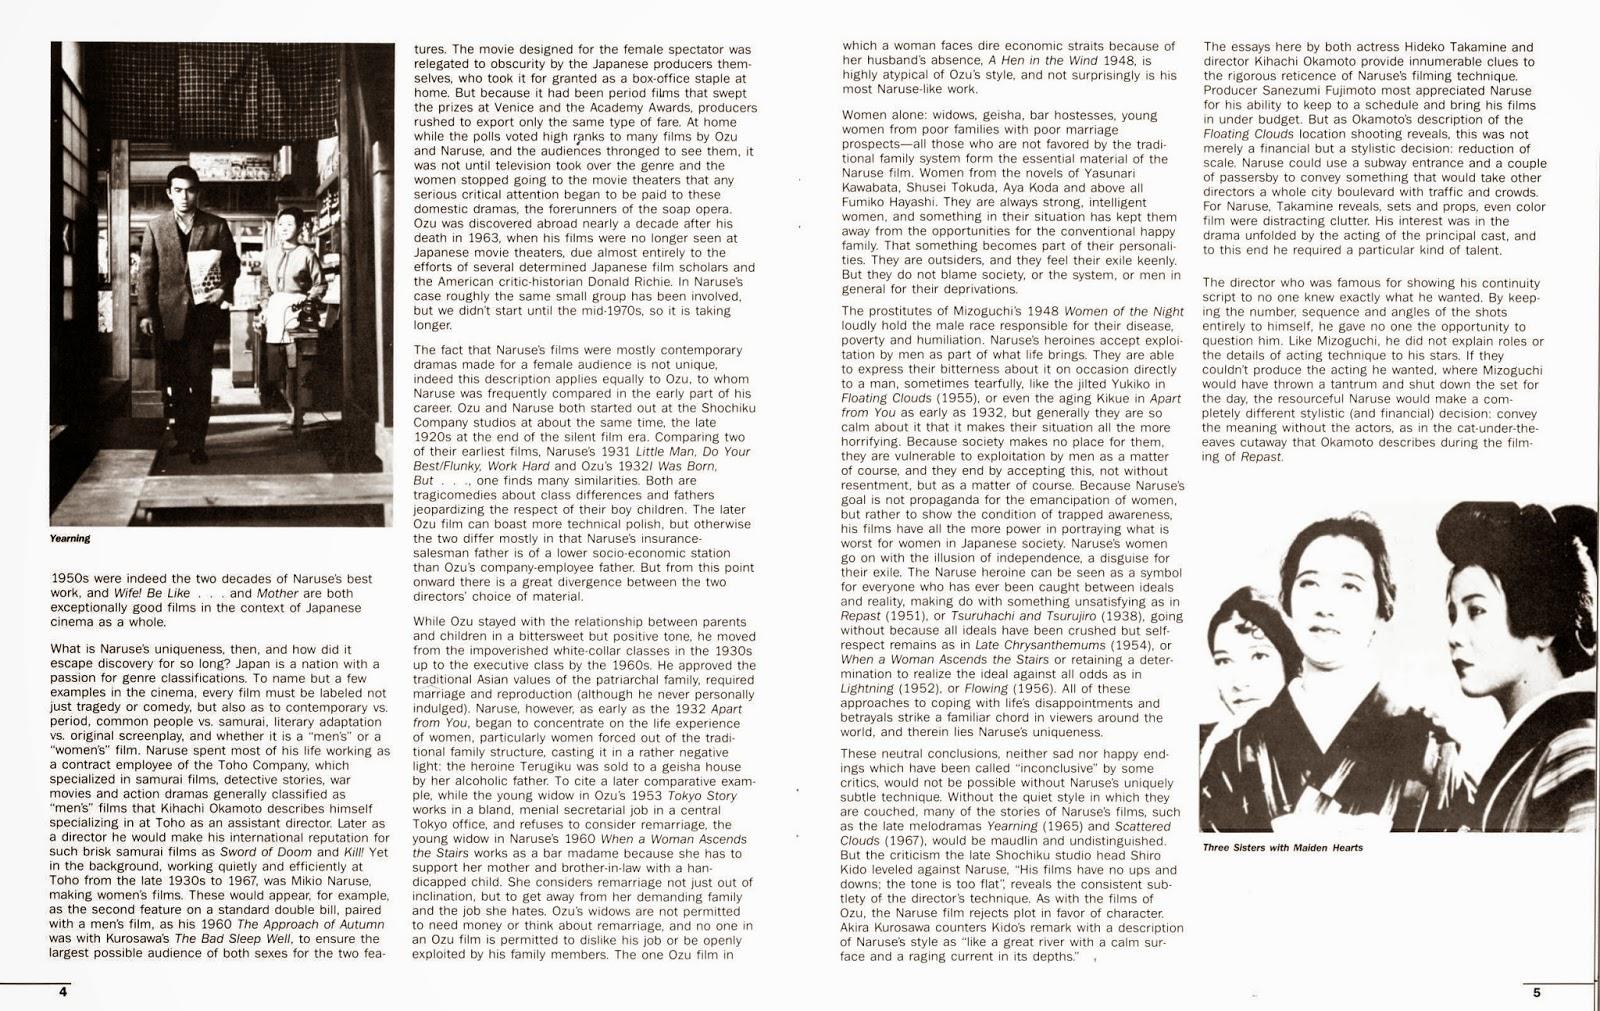 ozu films essay Adam mars-jones's essay on japanese film director yasujiro ozu goes a long way to demystifying a master enigmatically walked away from films in 1963.